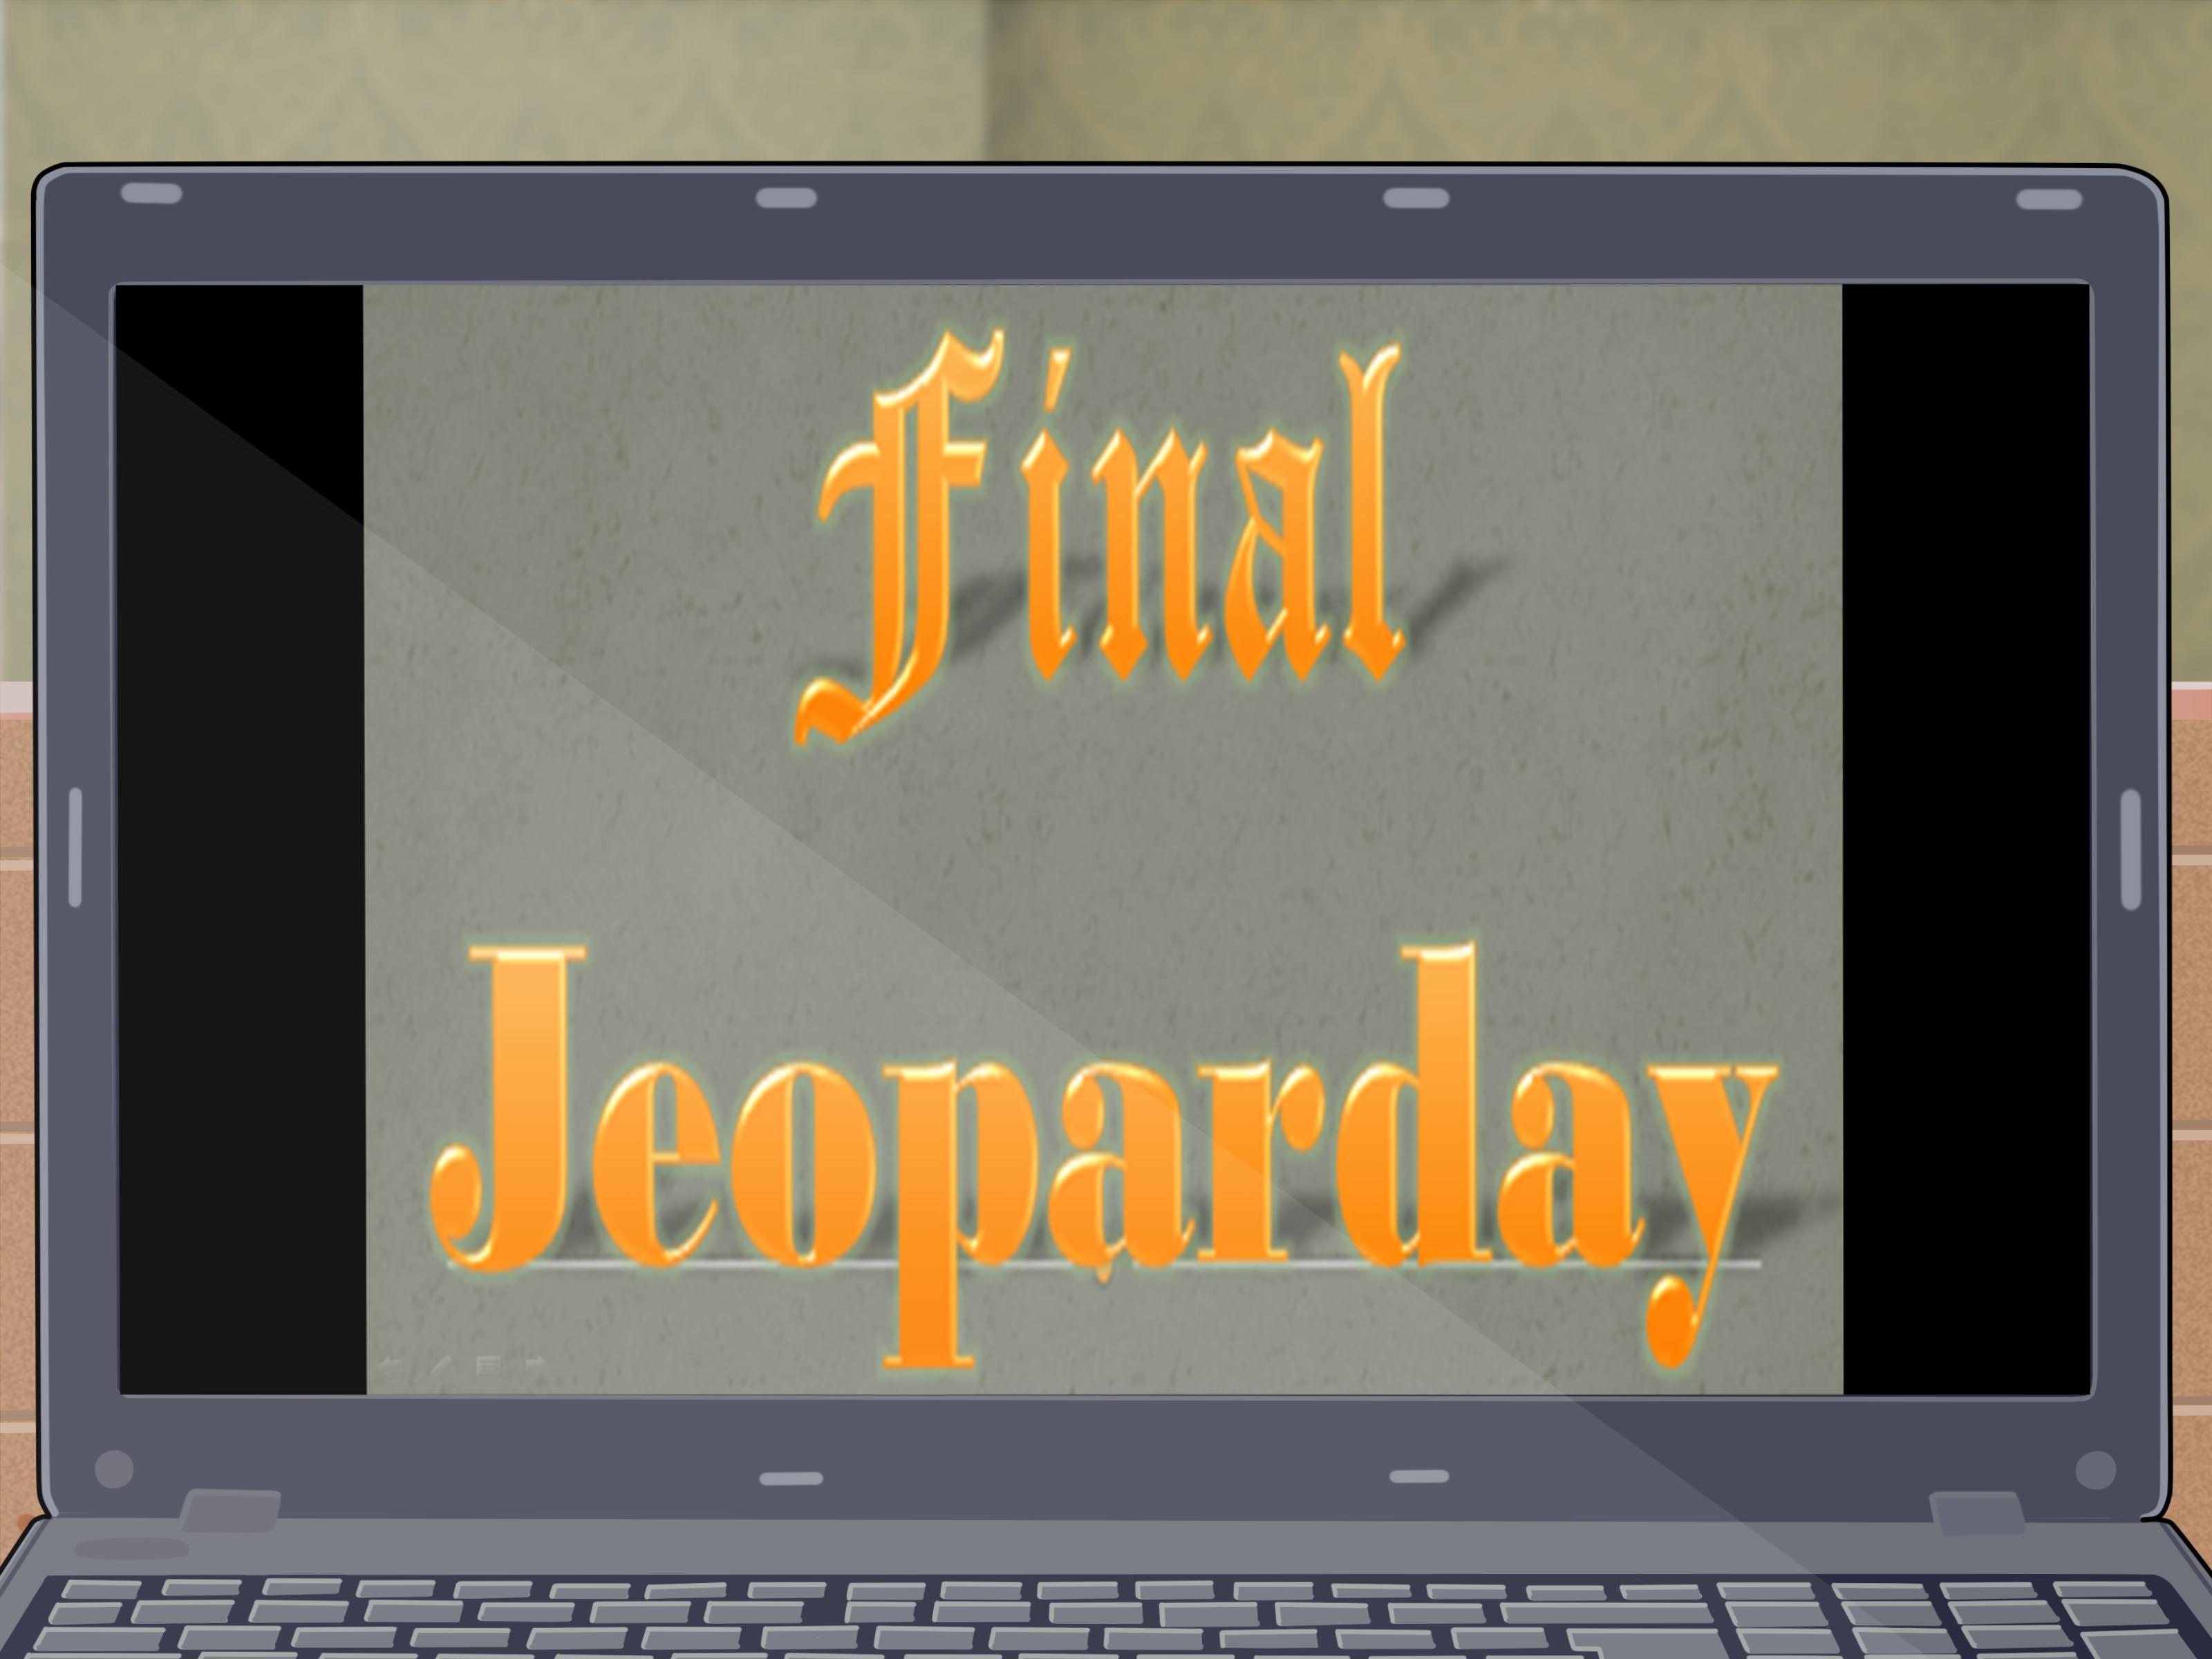 Come Creare Un Gioco A Quiz Jeopardy Game Con Powerpoint